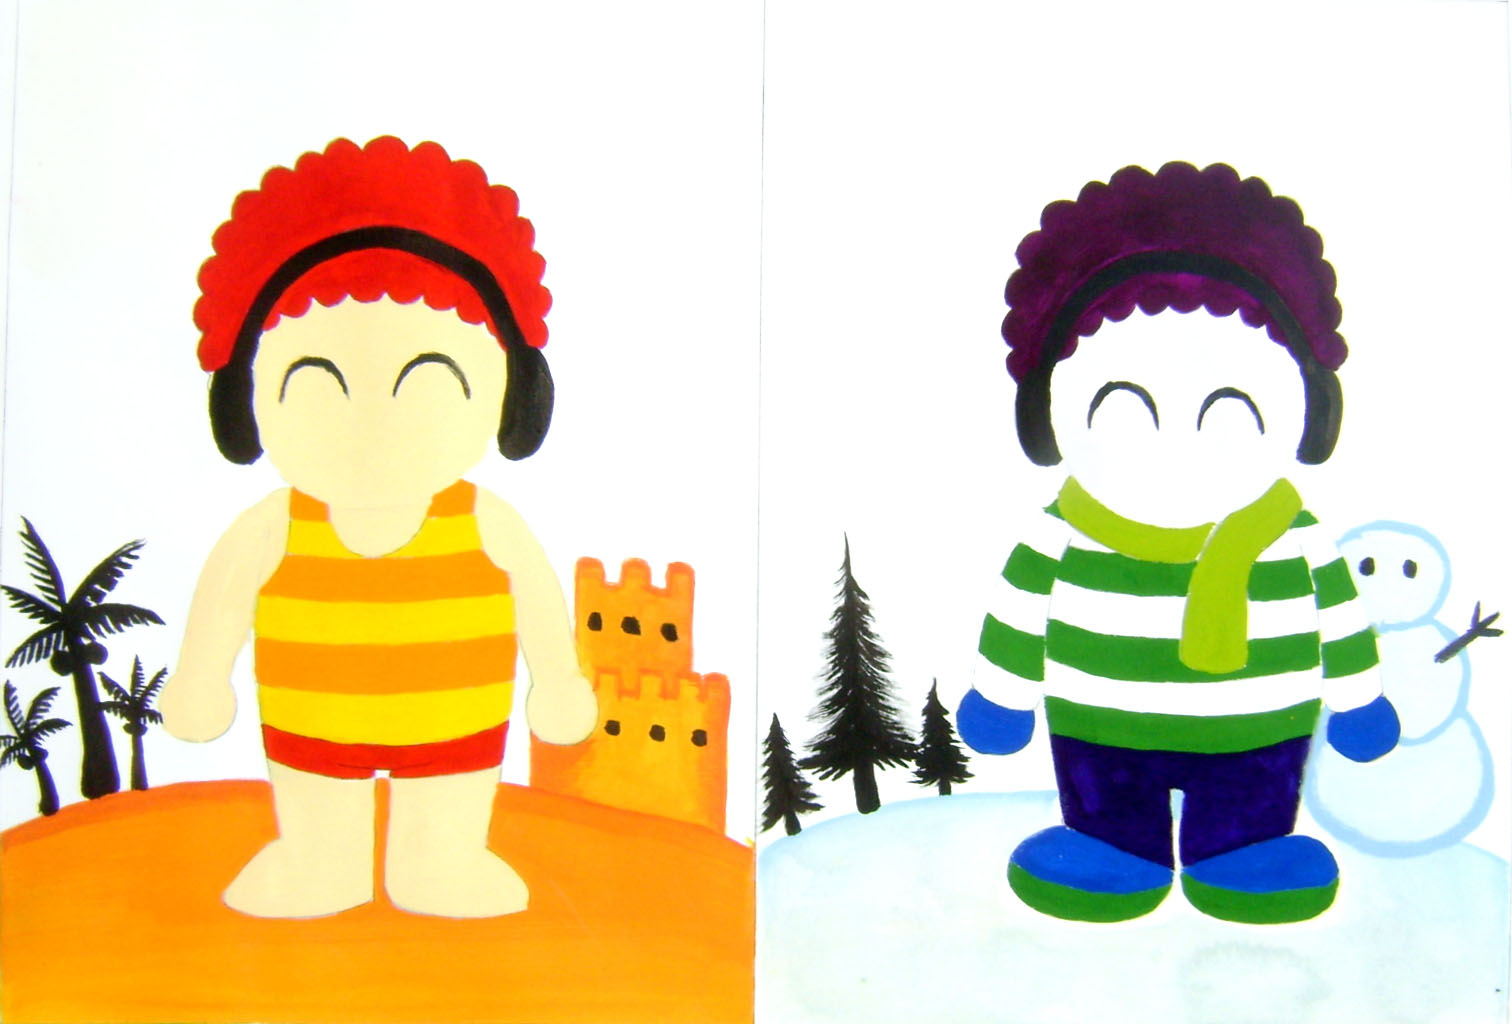 cores-quentes-x-cores-frias-coloracao-pessoal